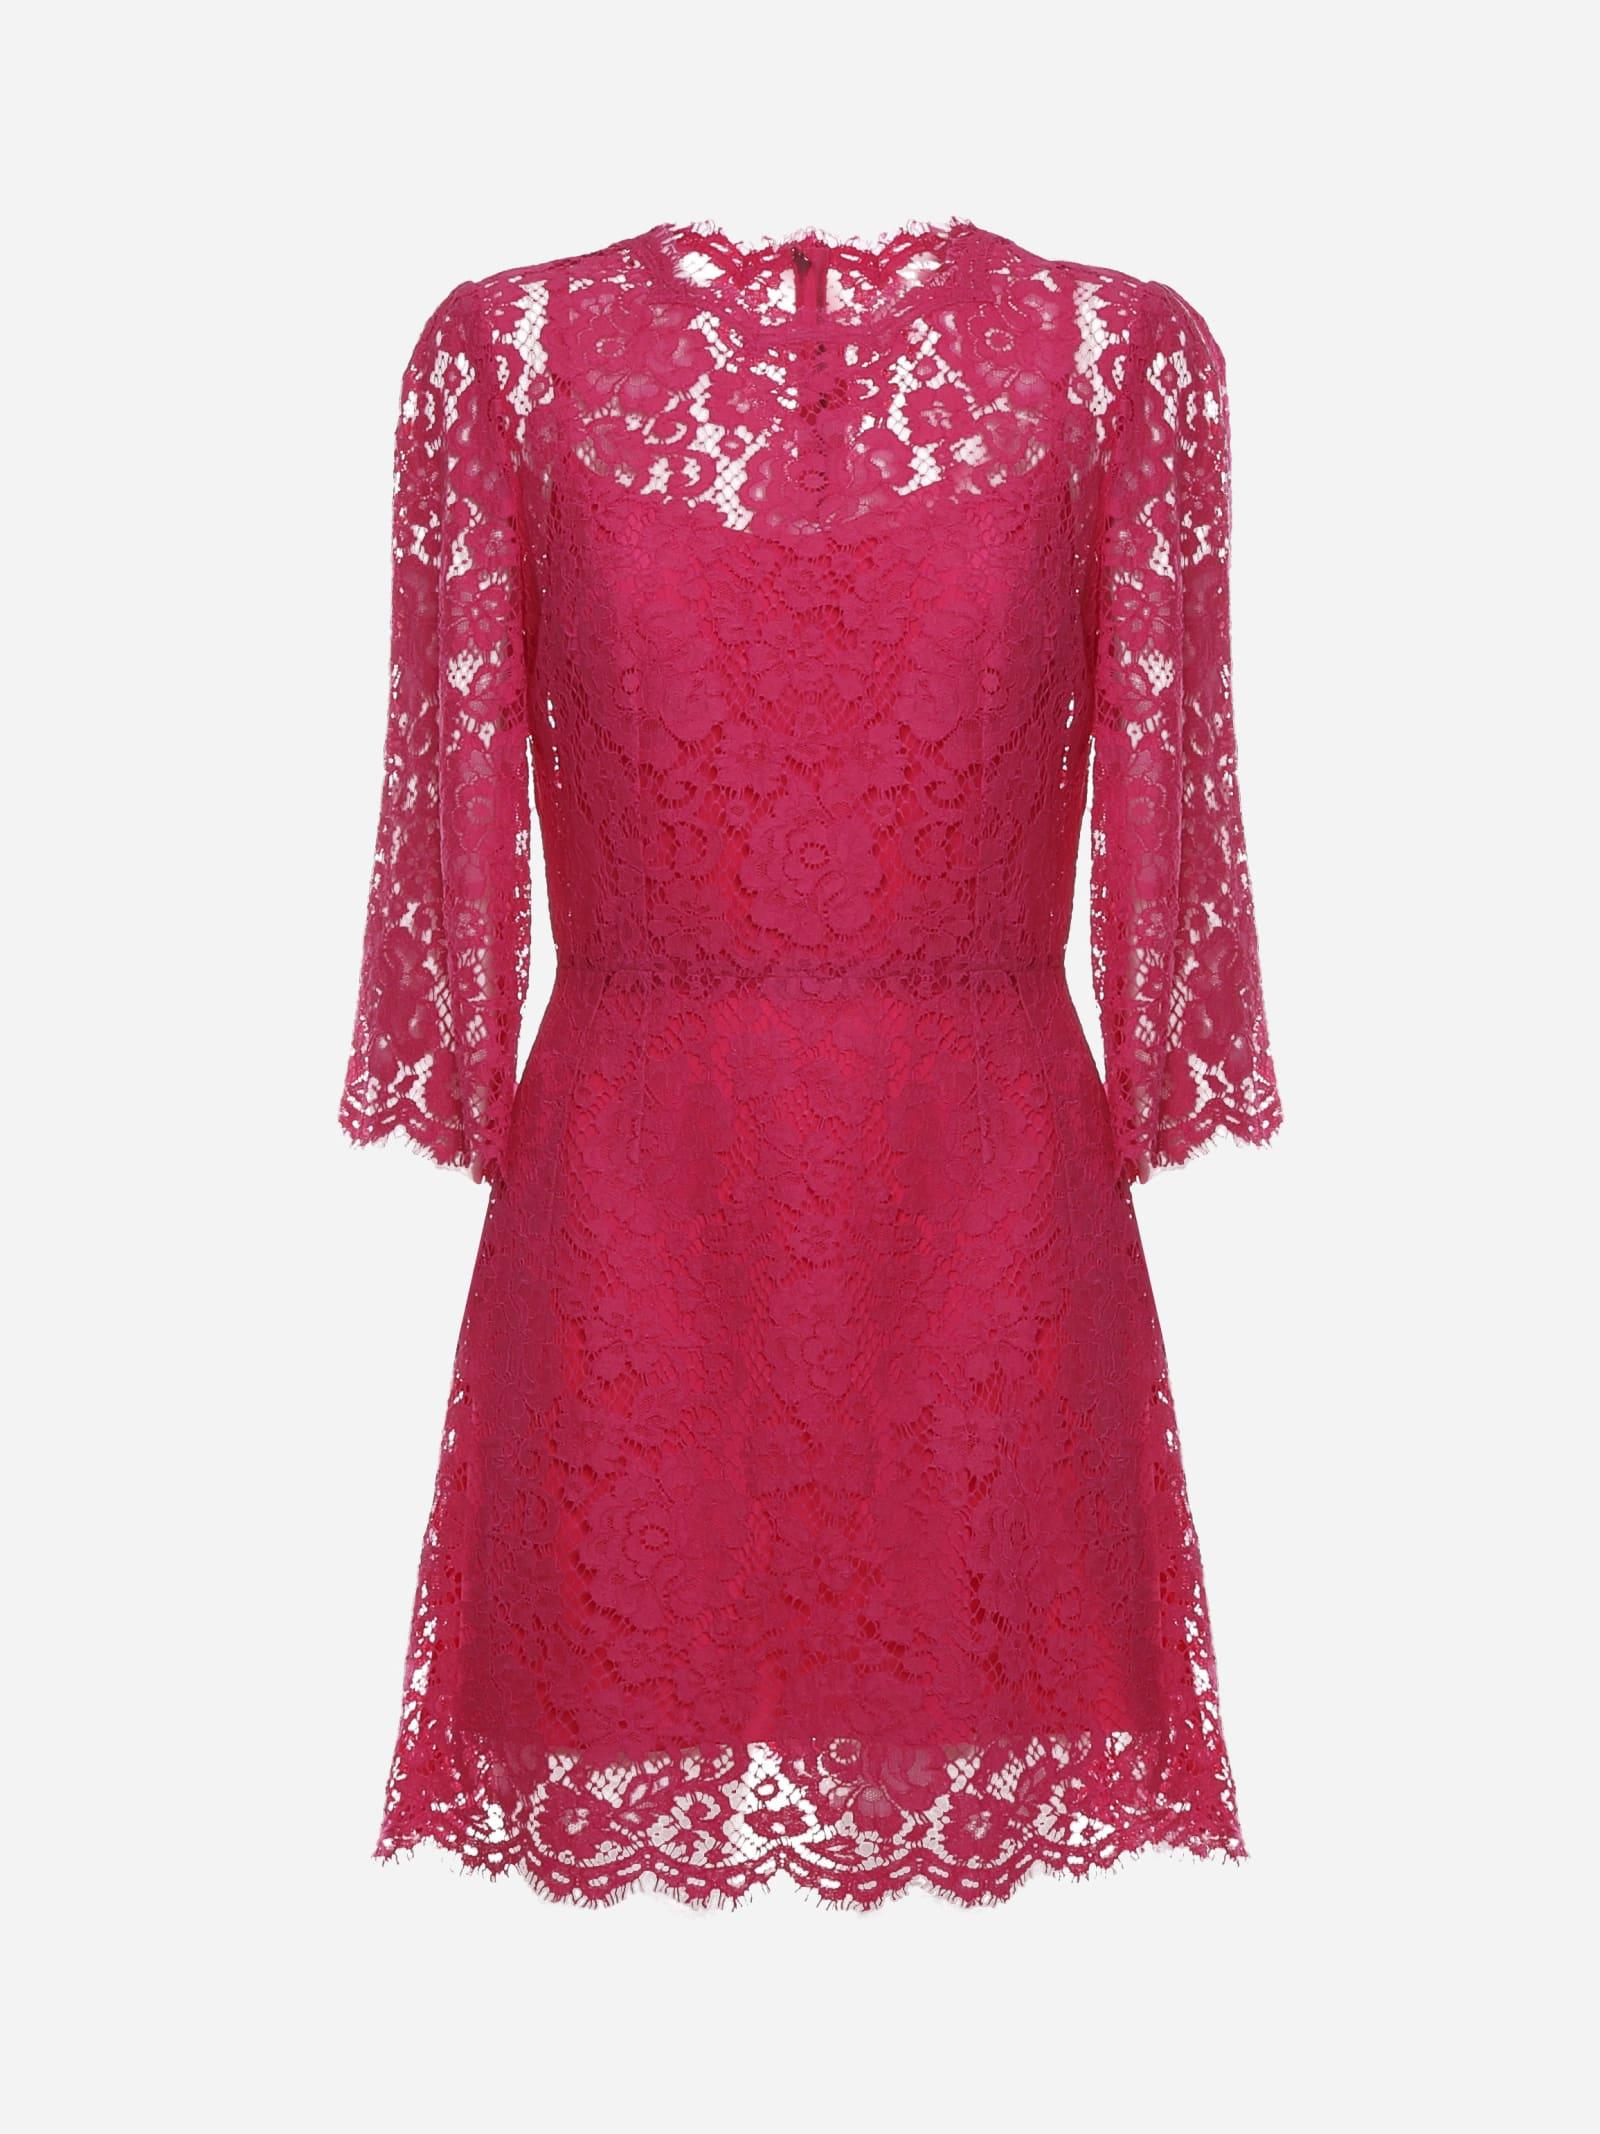 Dolce & Gabbana SHORT DRESS MADE OF CORDONETTO LACE